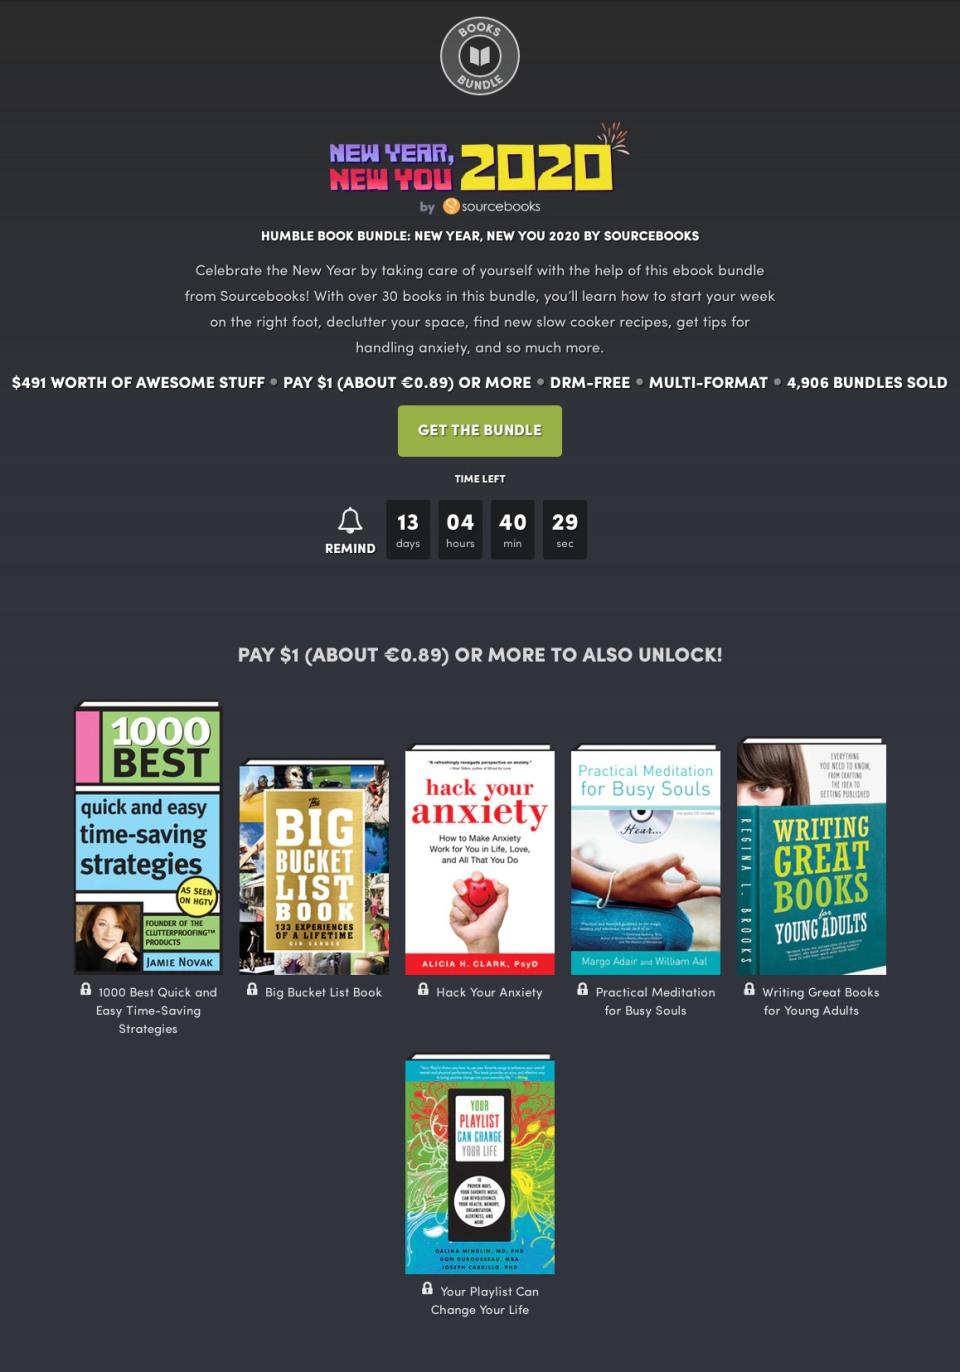 hbb-new-year-new-you-2020-books.jpg